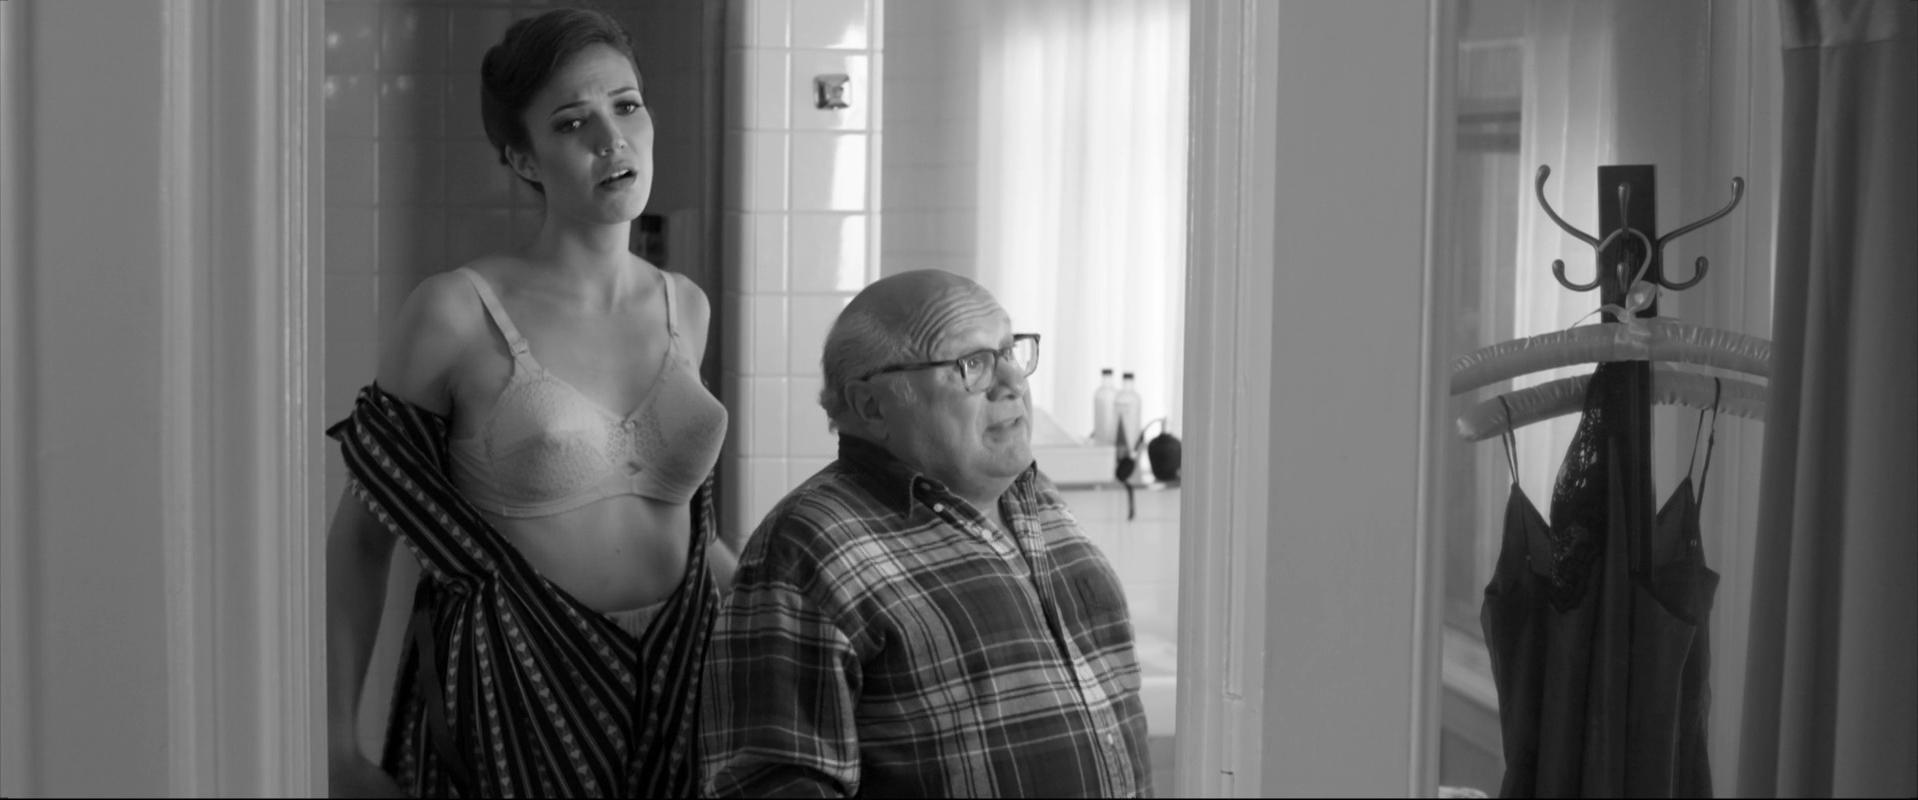 Nude Video Celebs  Mandy Moore Sexy - Hotel Noir 2012-1568